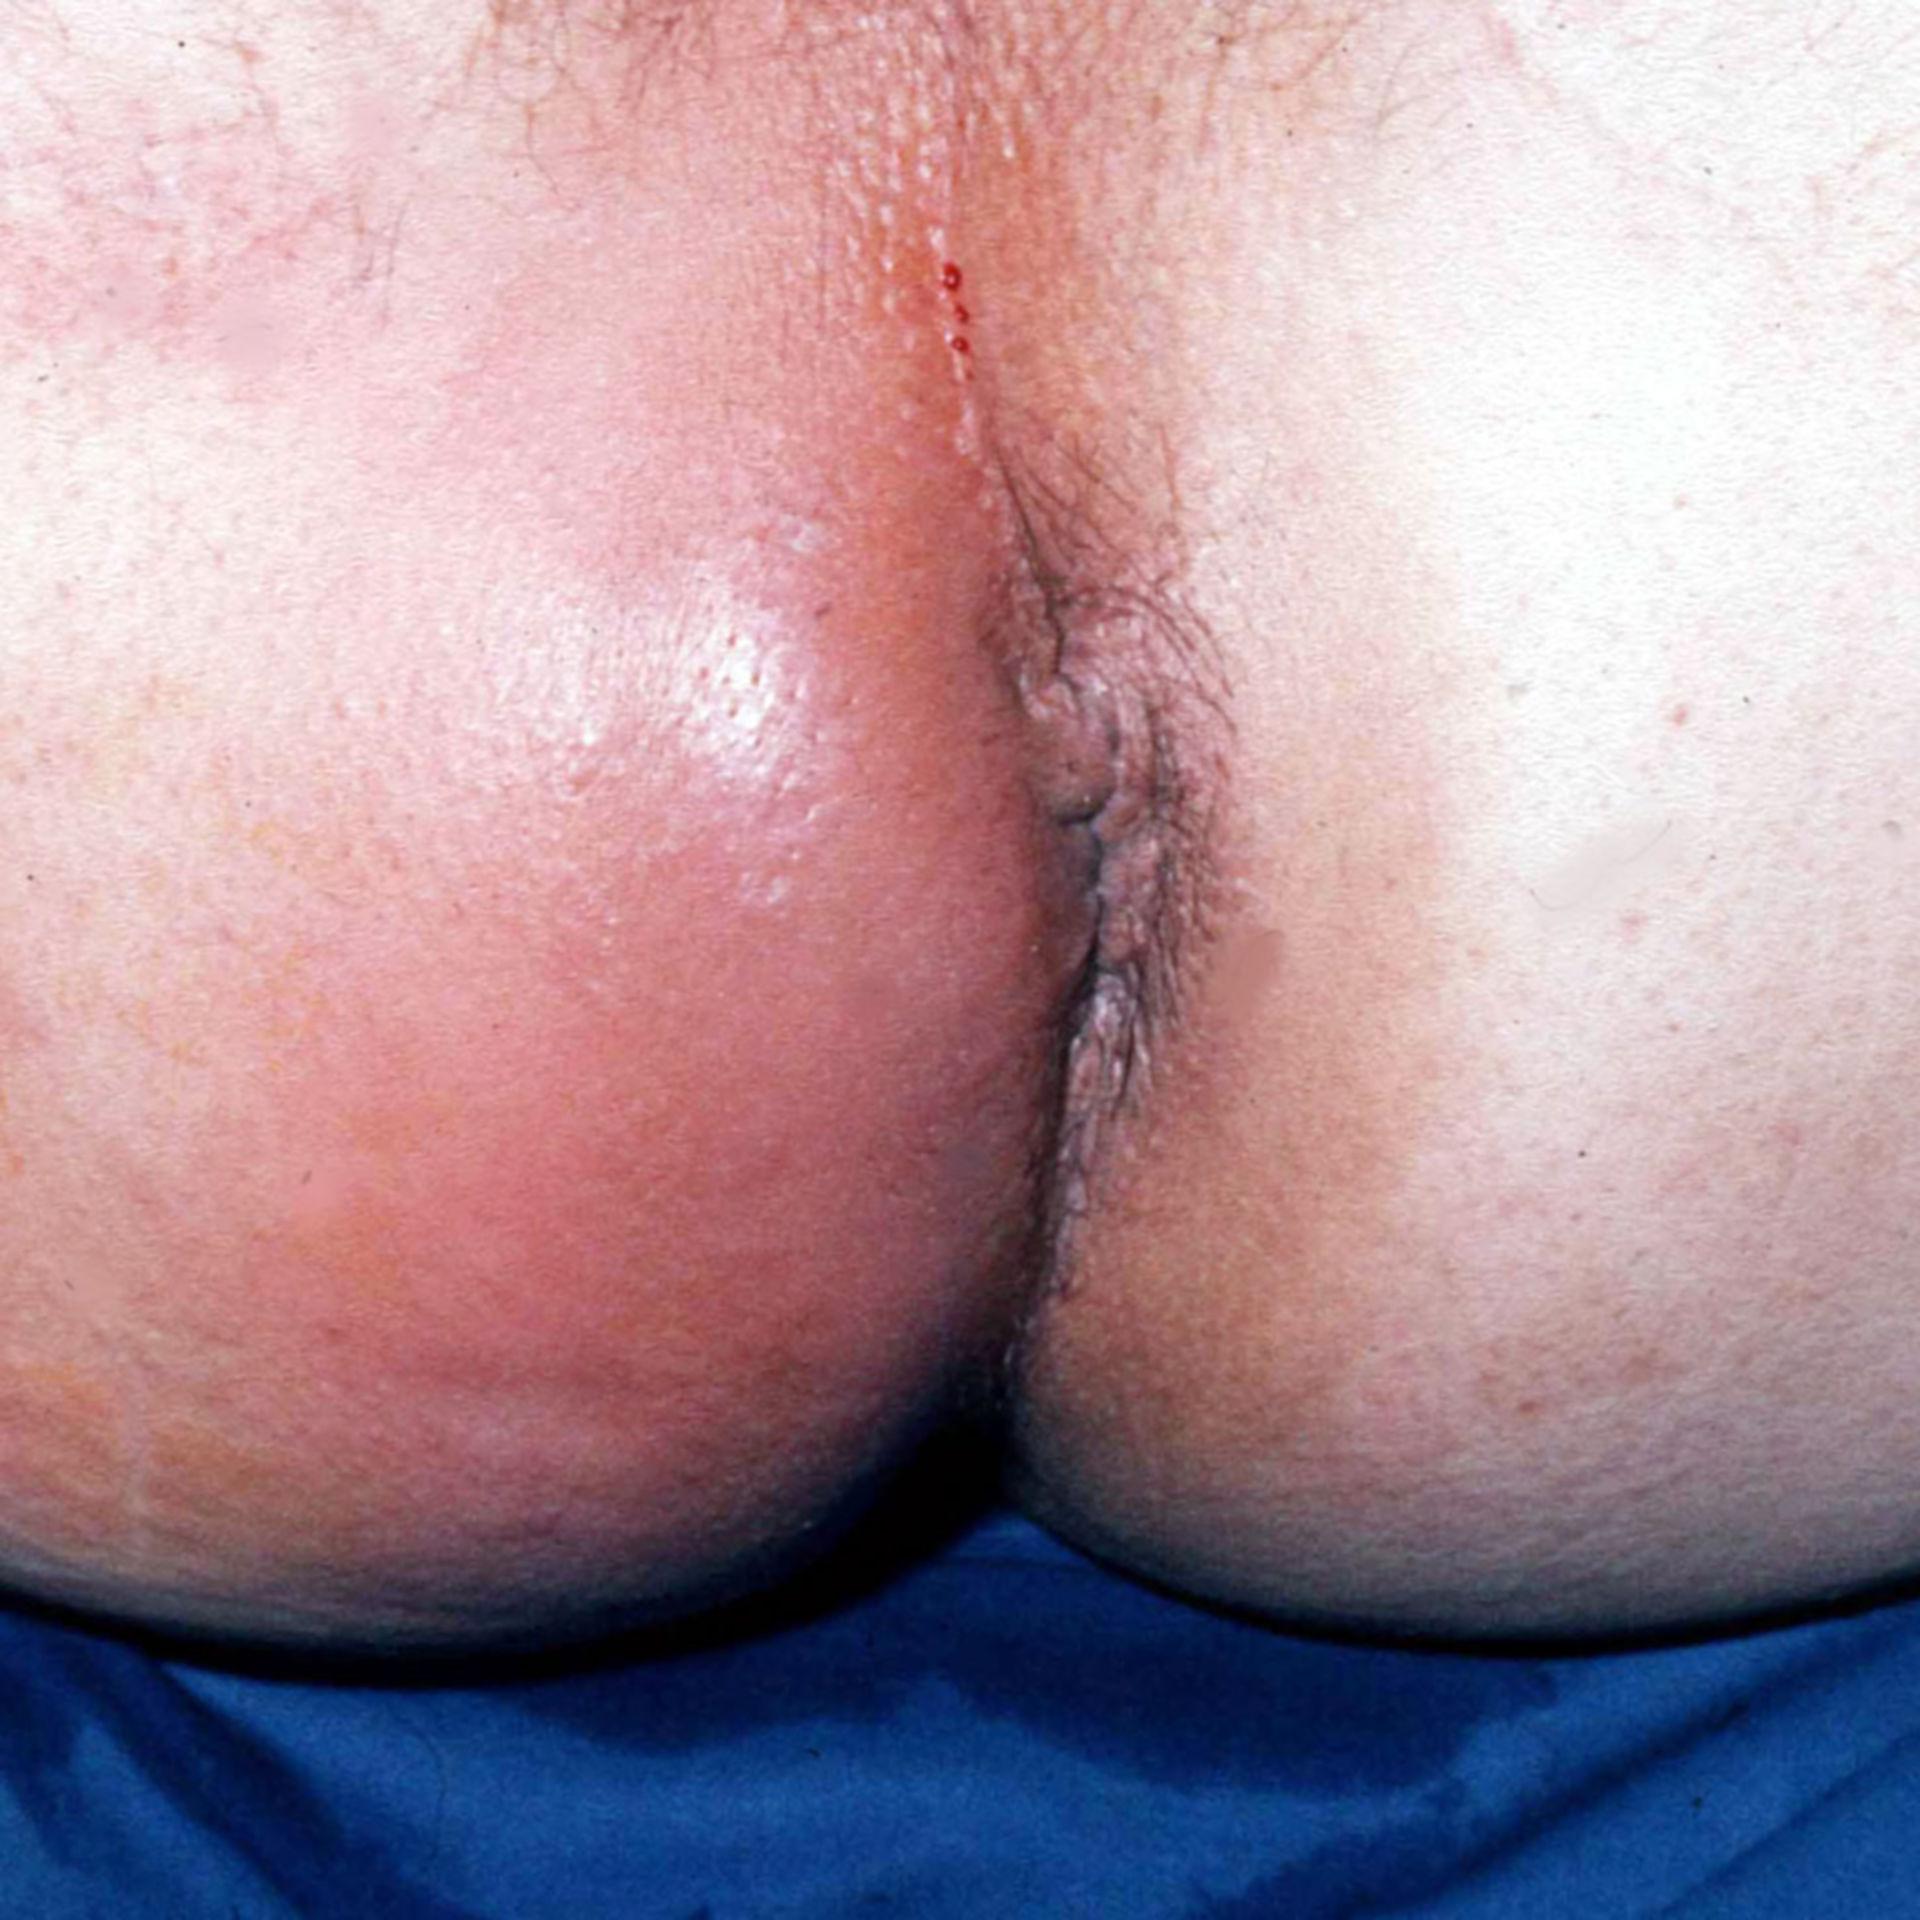 Transsphincteric abscess